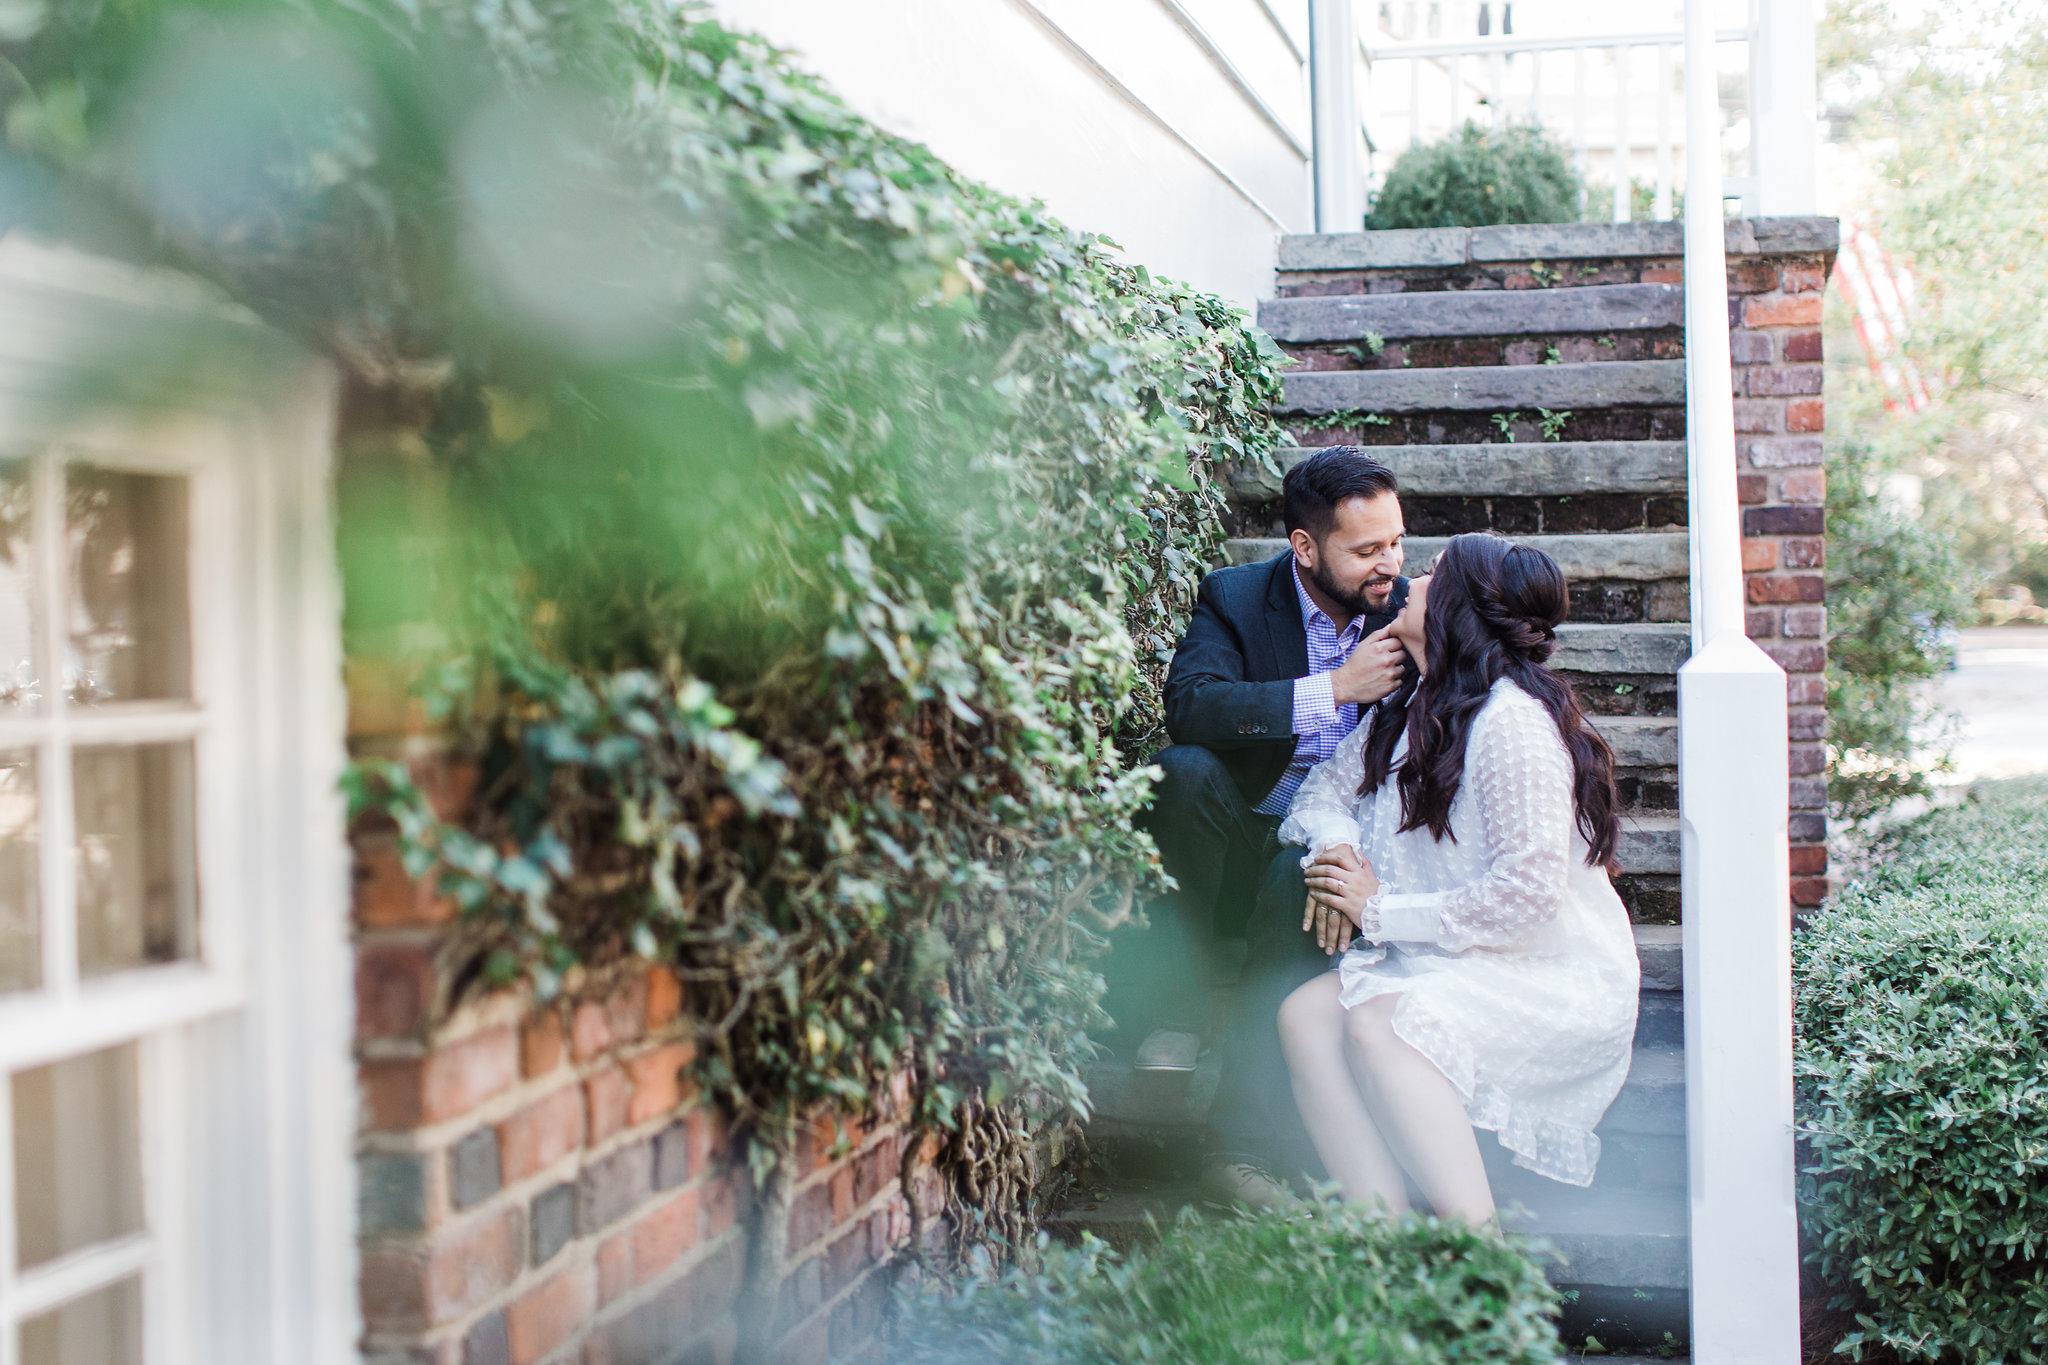 apt-b-photography-Savannah-wedding-photographer-savannah-engagement-photographer-historic-savannah-engagement-savannah-weddings-hilton-head-wedding-photographer-hilton-head-engagement-9.jpg